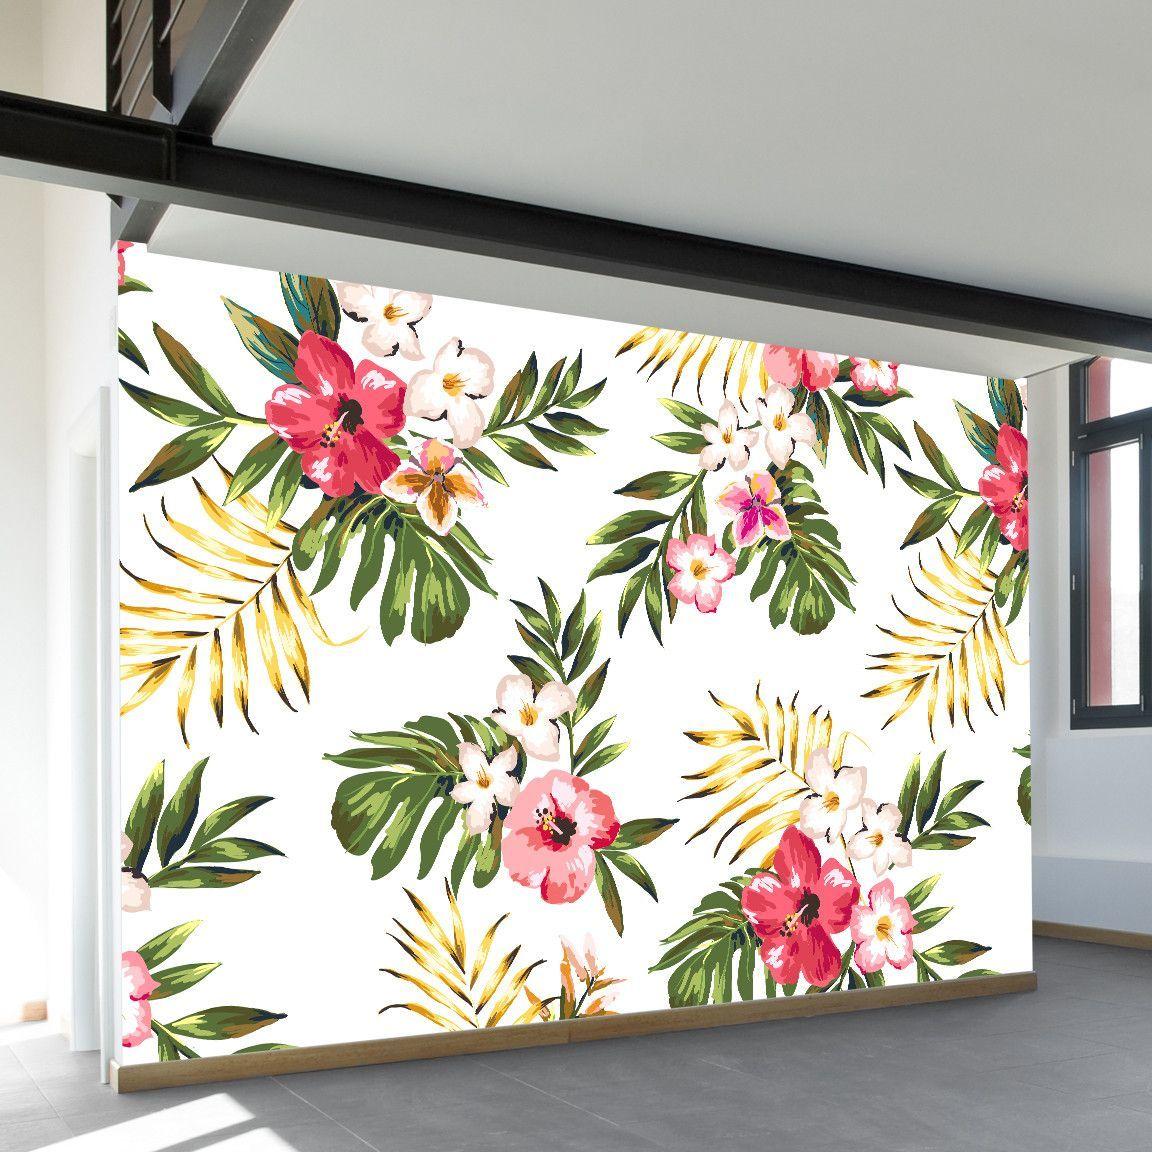 Tropical Flowers Two Wall Mural Wall Murals Mural Tropical Fabric Prints